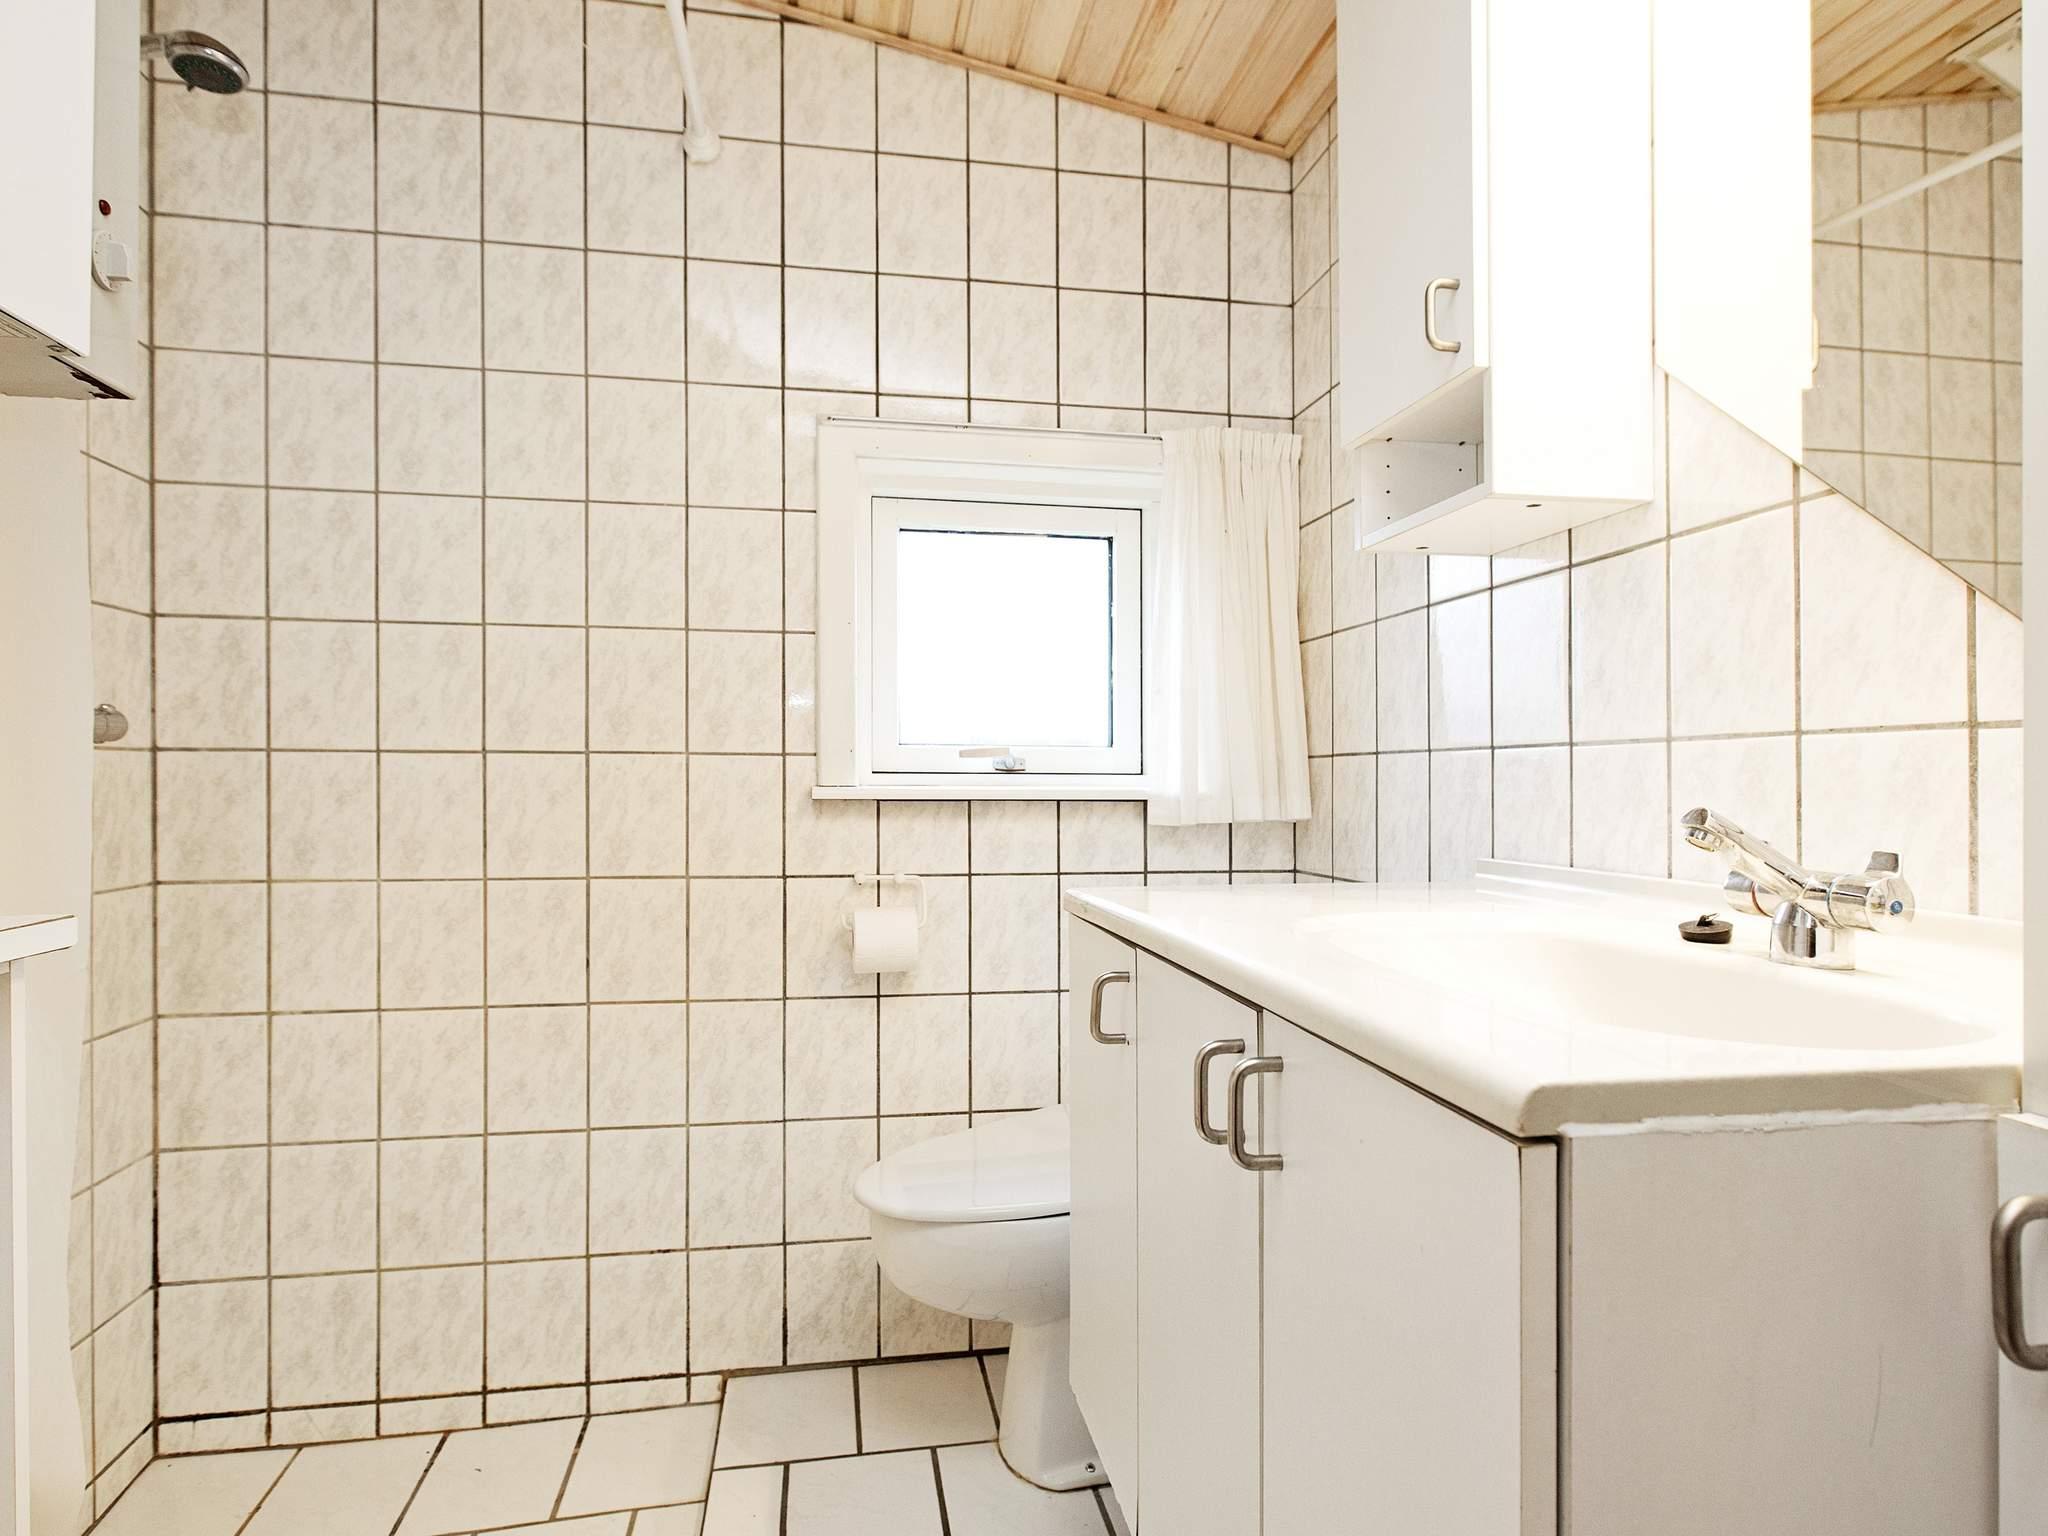 Maison de vacances Kramnitze (87262), Kramnitse, , Lolland, Danemark, image 1